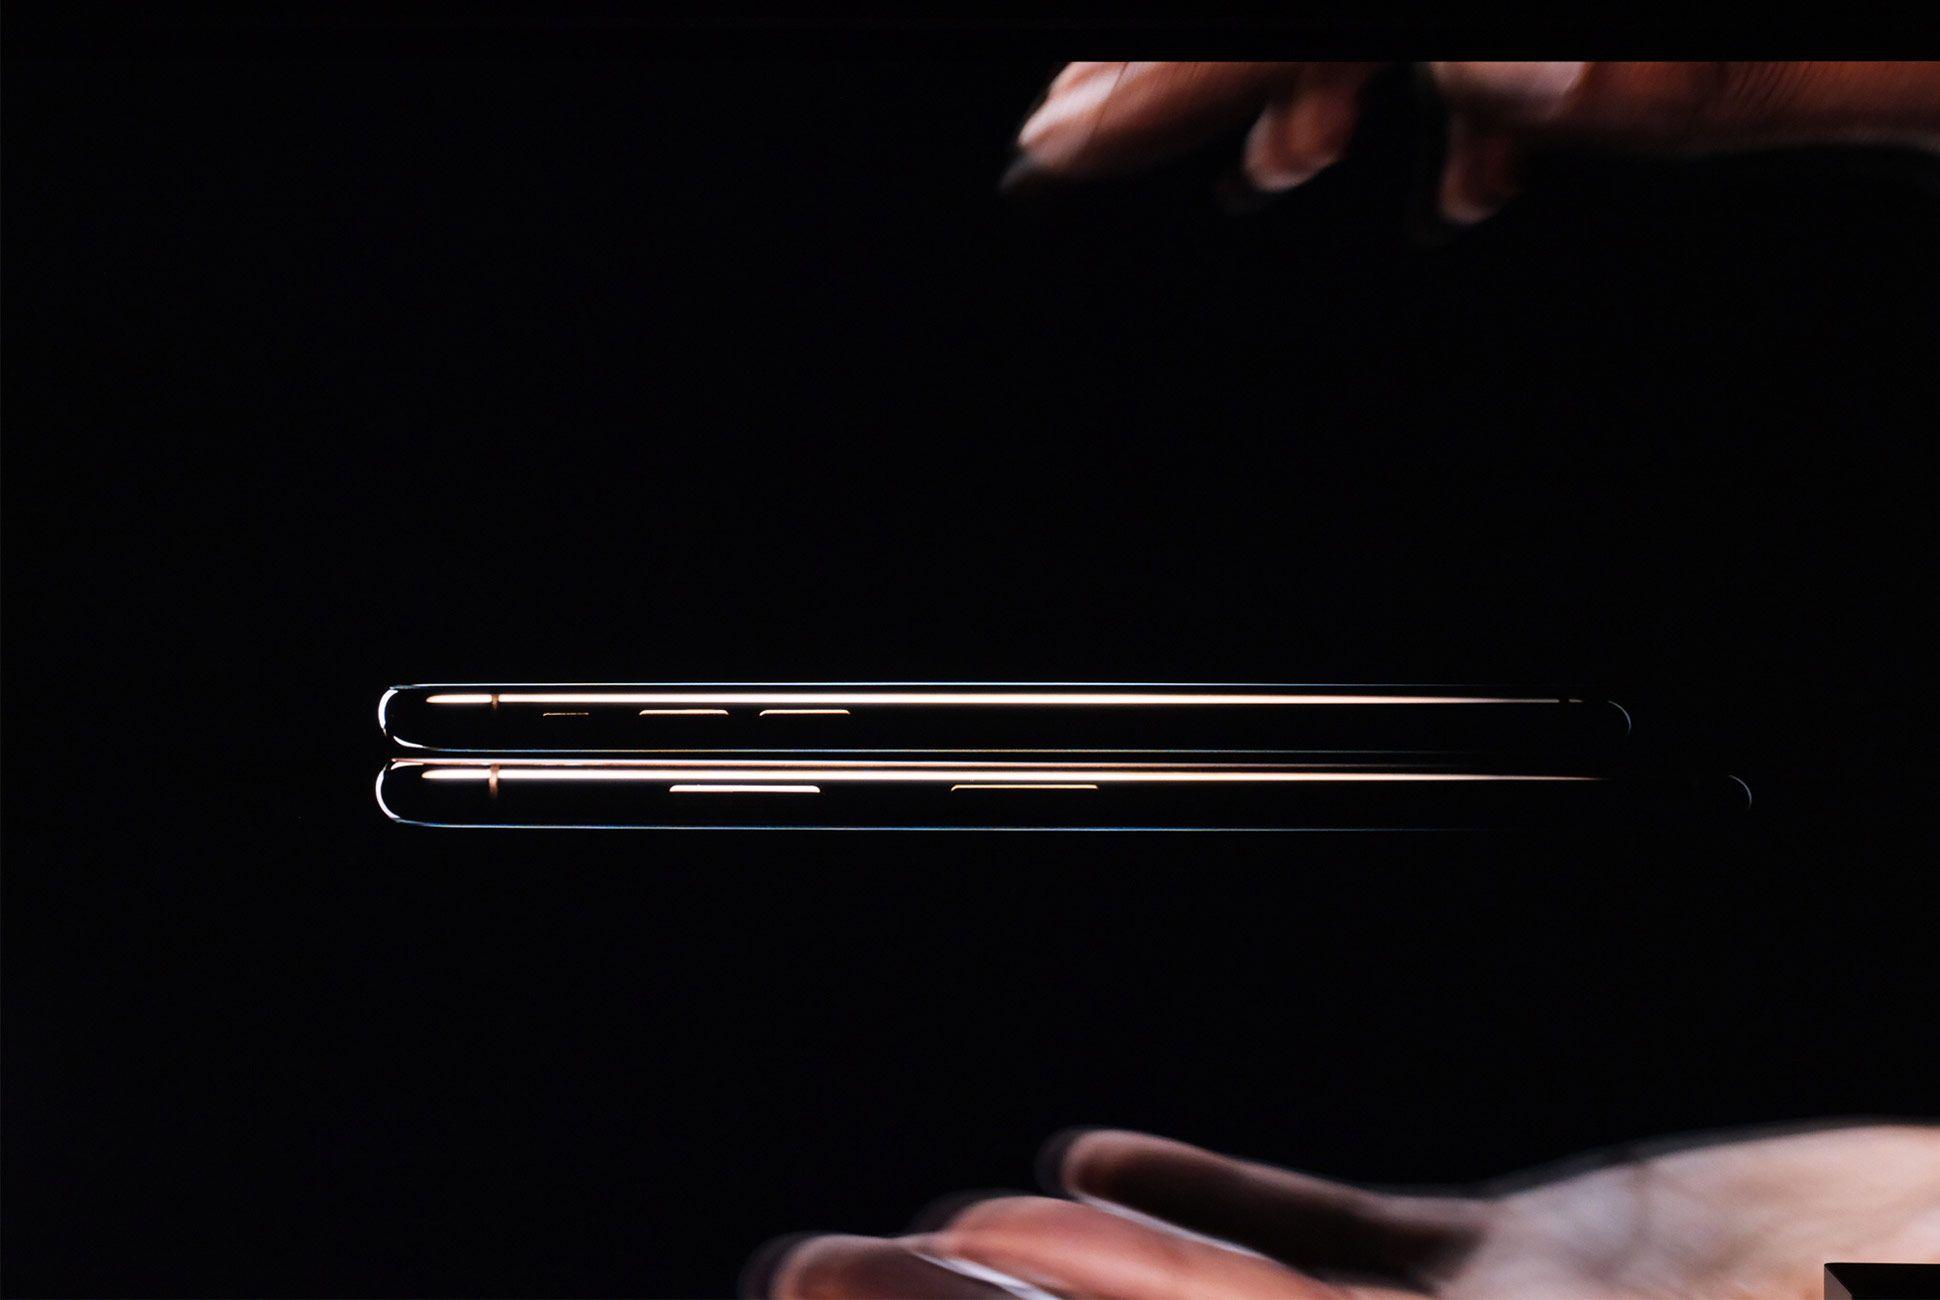 Apple-Event-LIVE-iPhone-Gear-Patrol-Slide-1